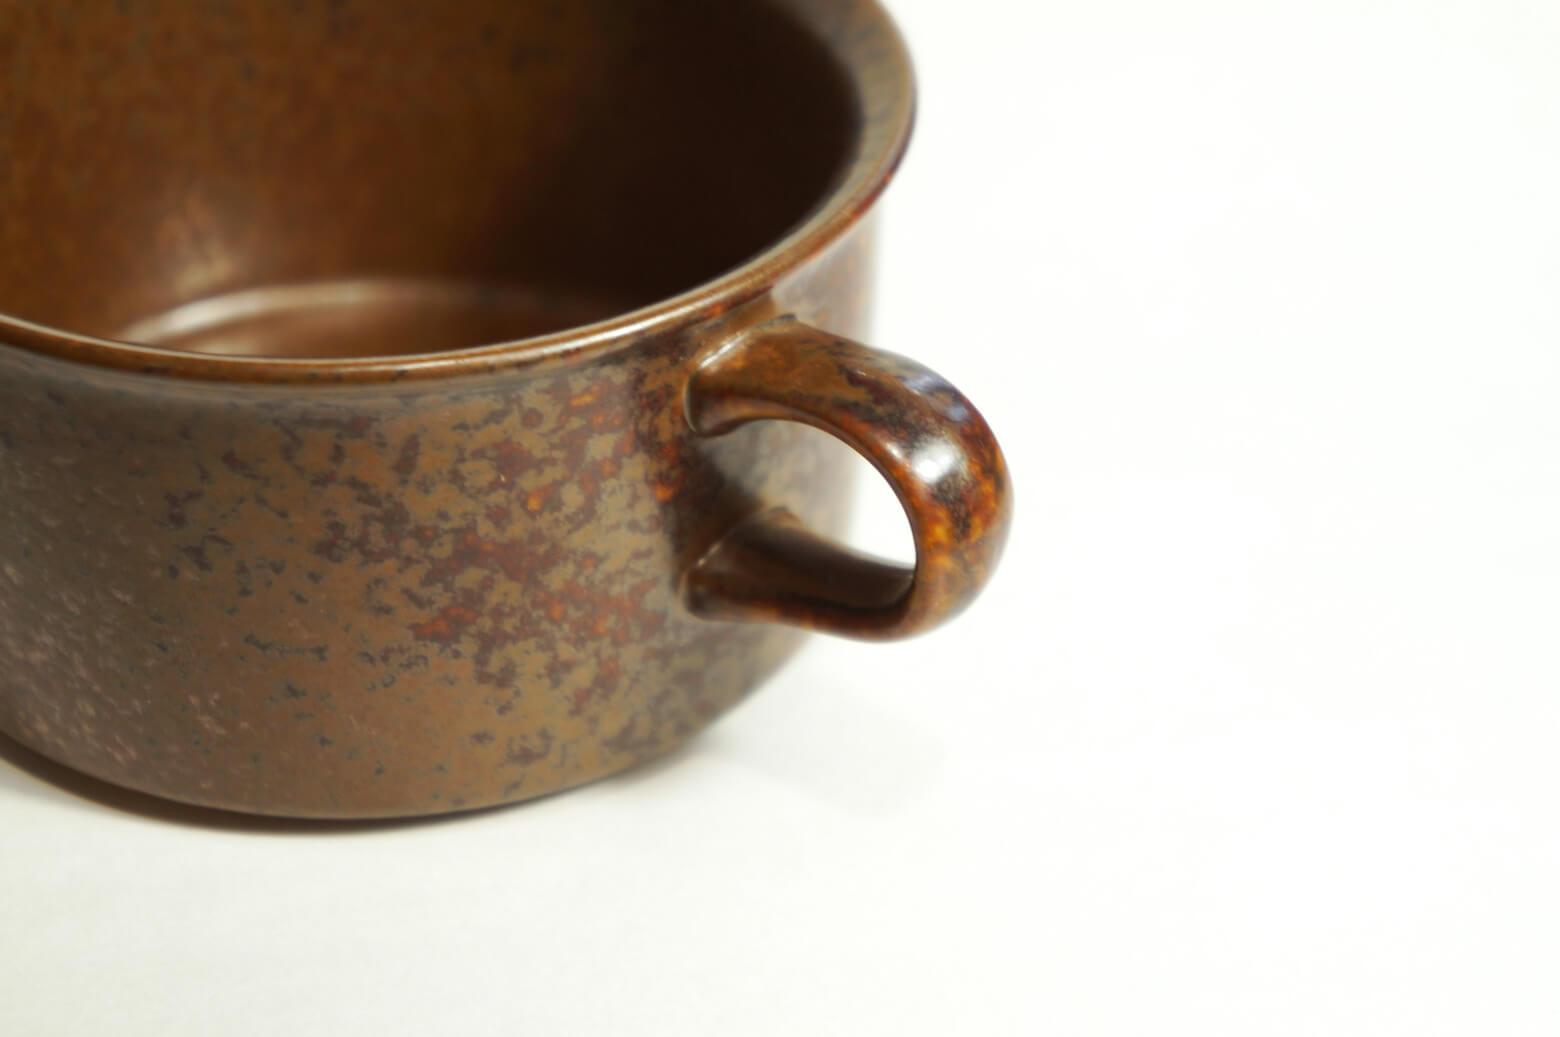 ARABIA Tea Cup and Saucer Ruska designed by Ulla Procope/アラビア ルスカ ティーカップ アンド ソーサー ウラ・プロコッペ 北欧ヴィンテージ食器 2